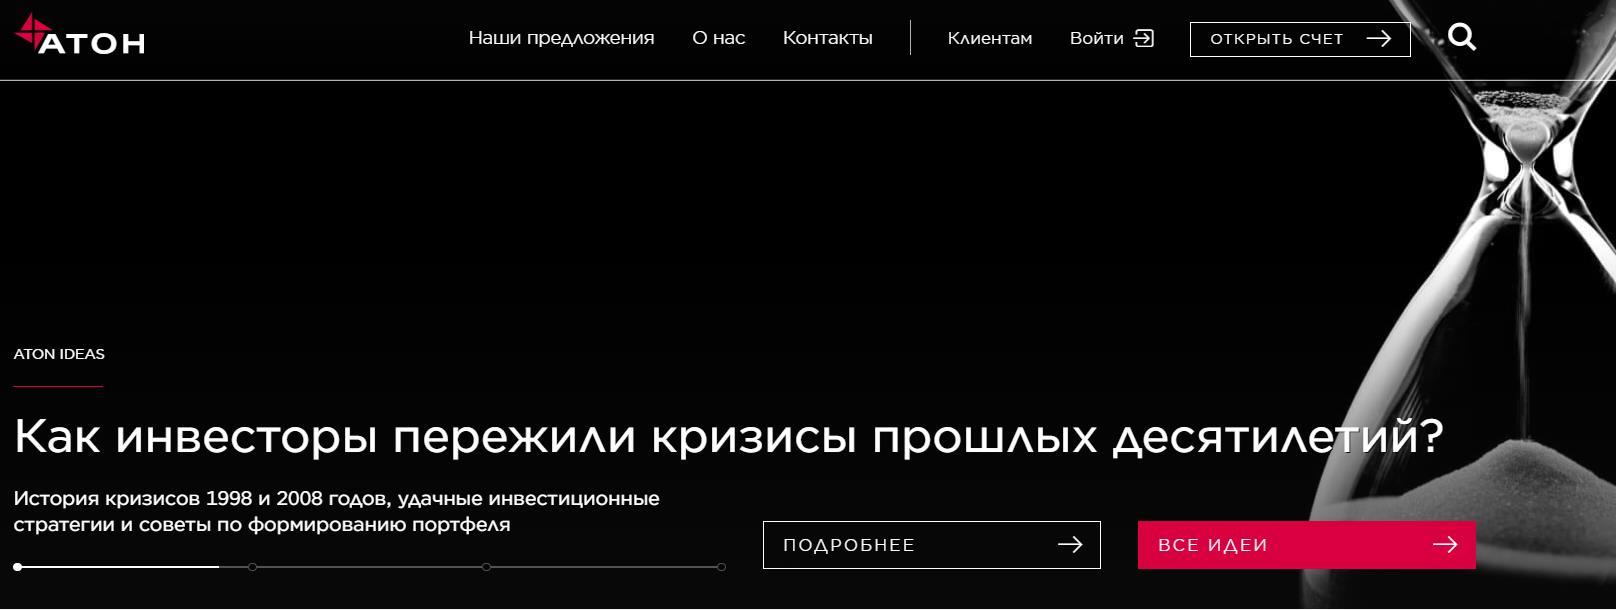 правда про компанию АТОН